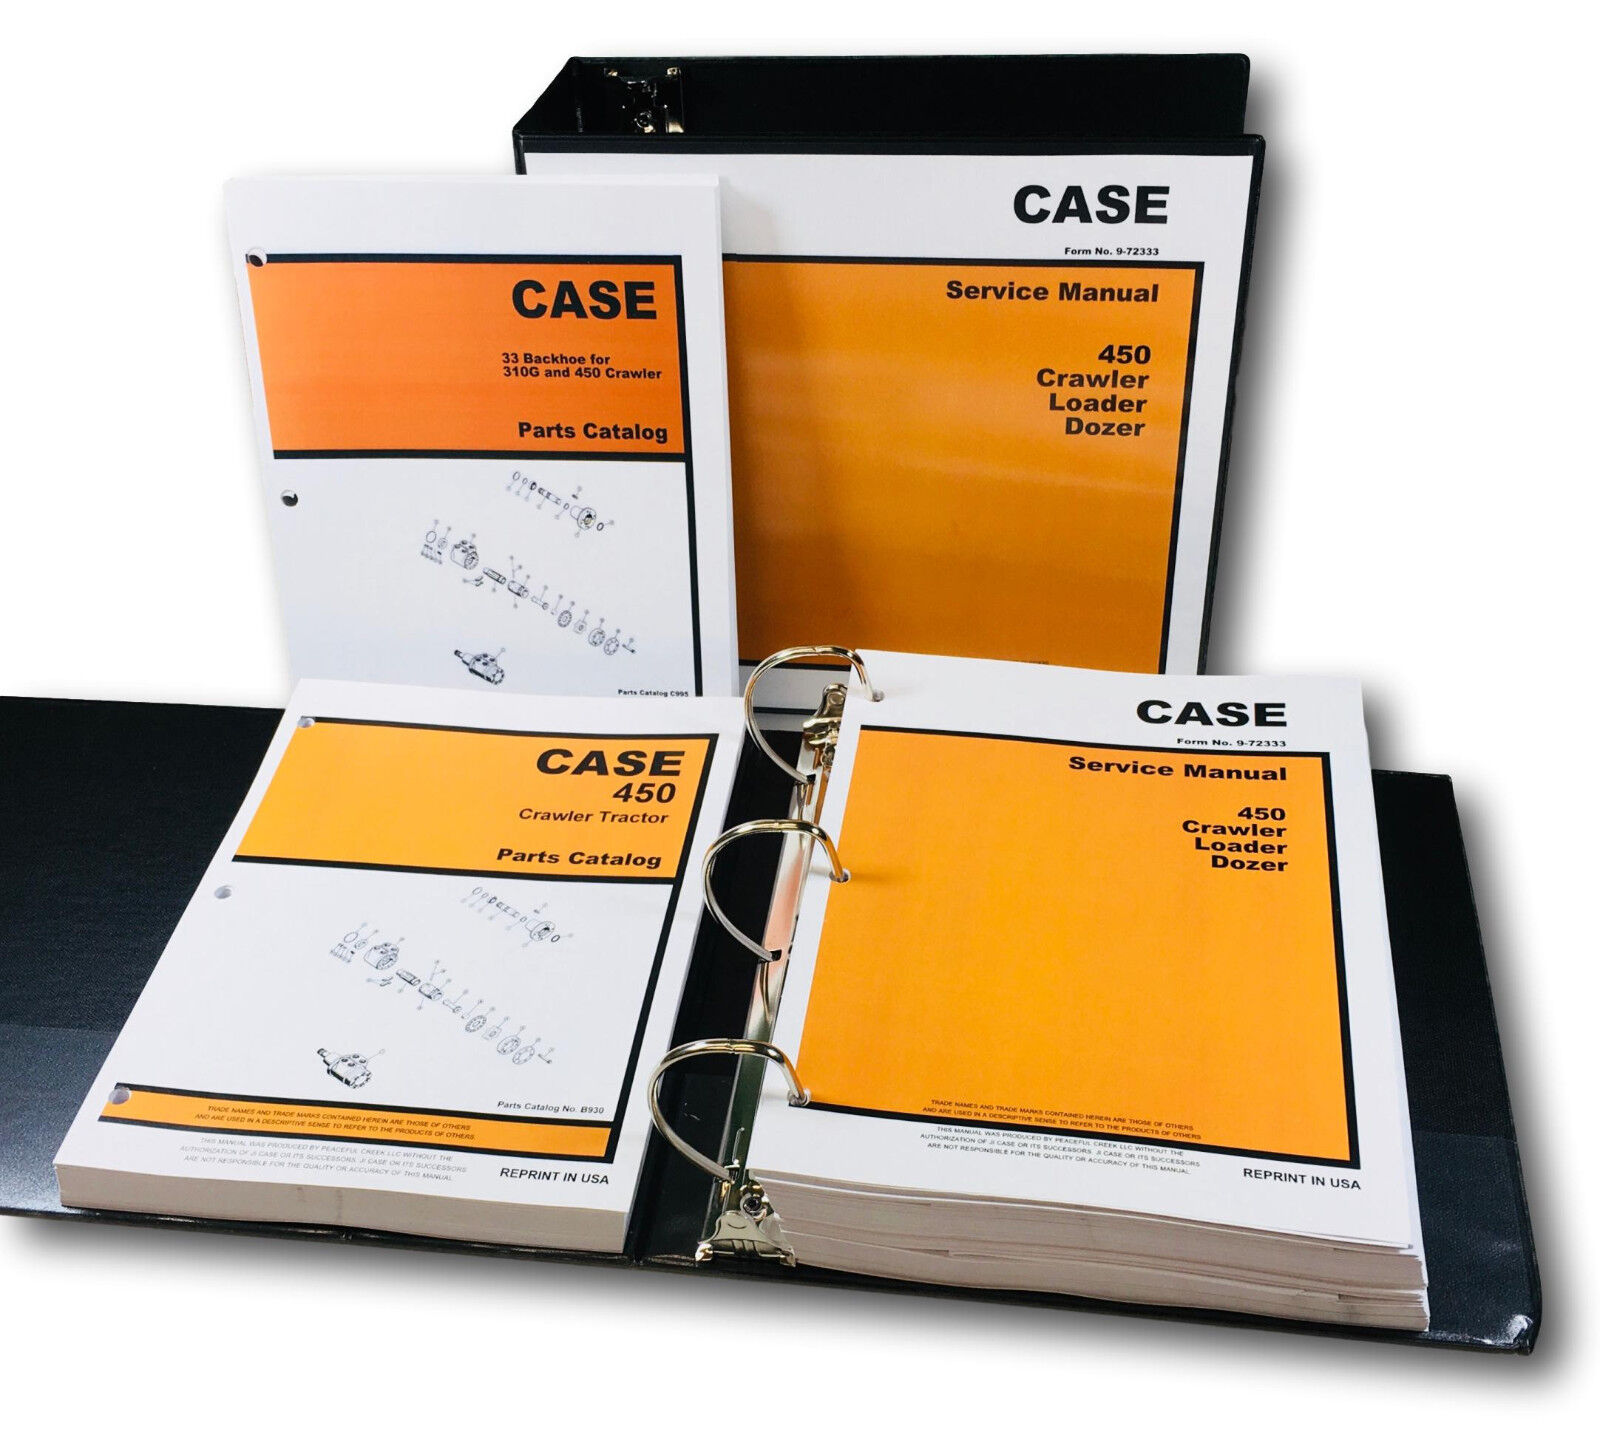 Complete Service/Overhaul/Repair/& Parts Manuals